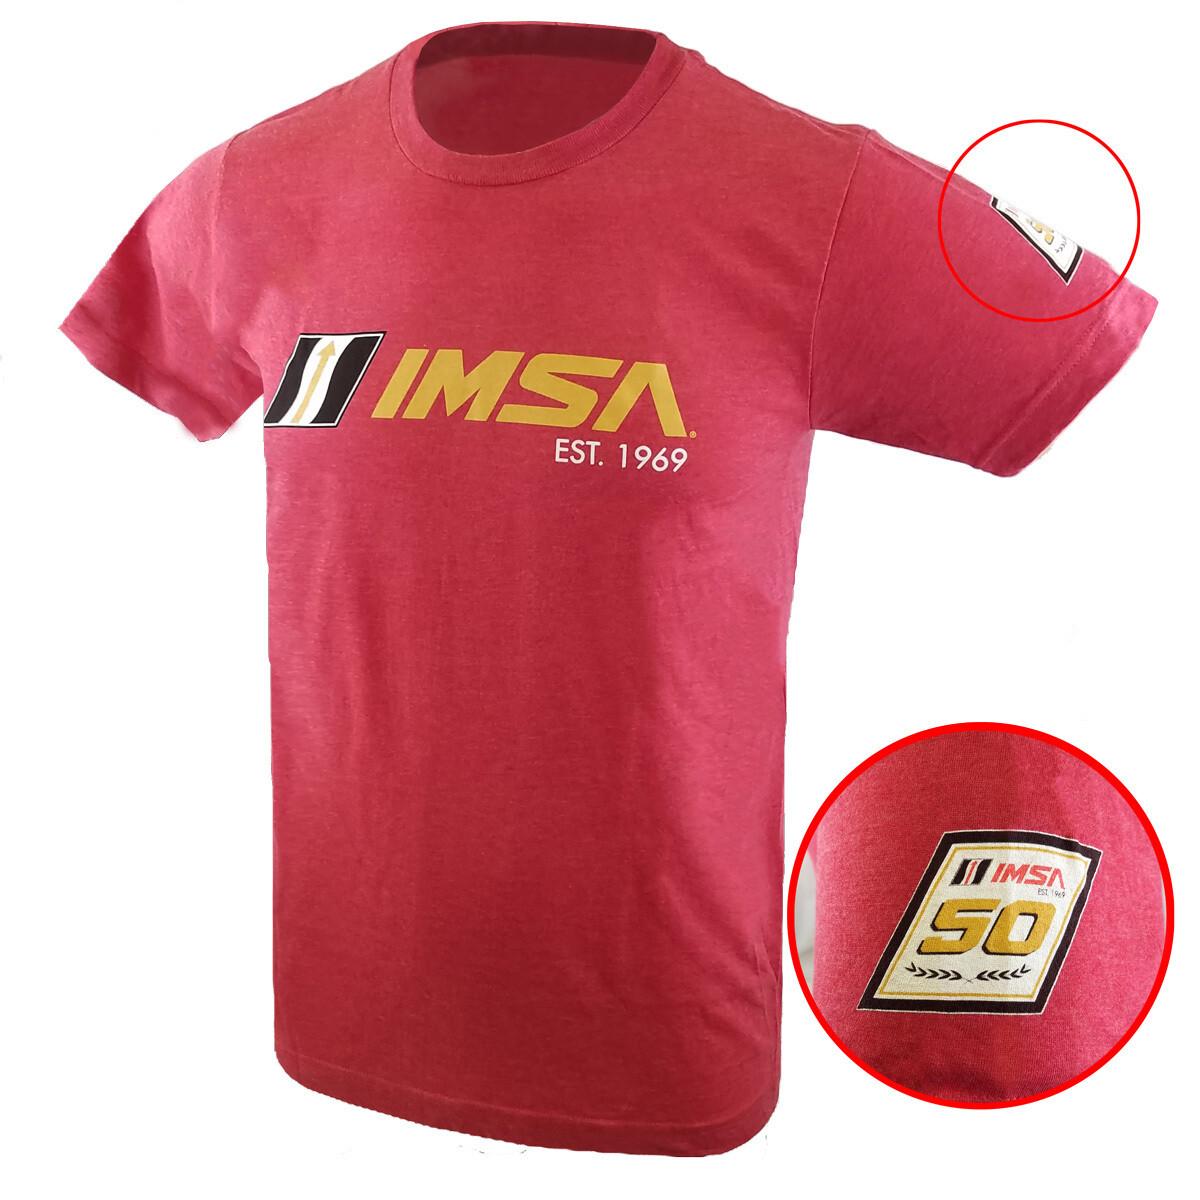 IMSA Est. 1969 Full Front Logo Tee - Heather Red